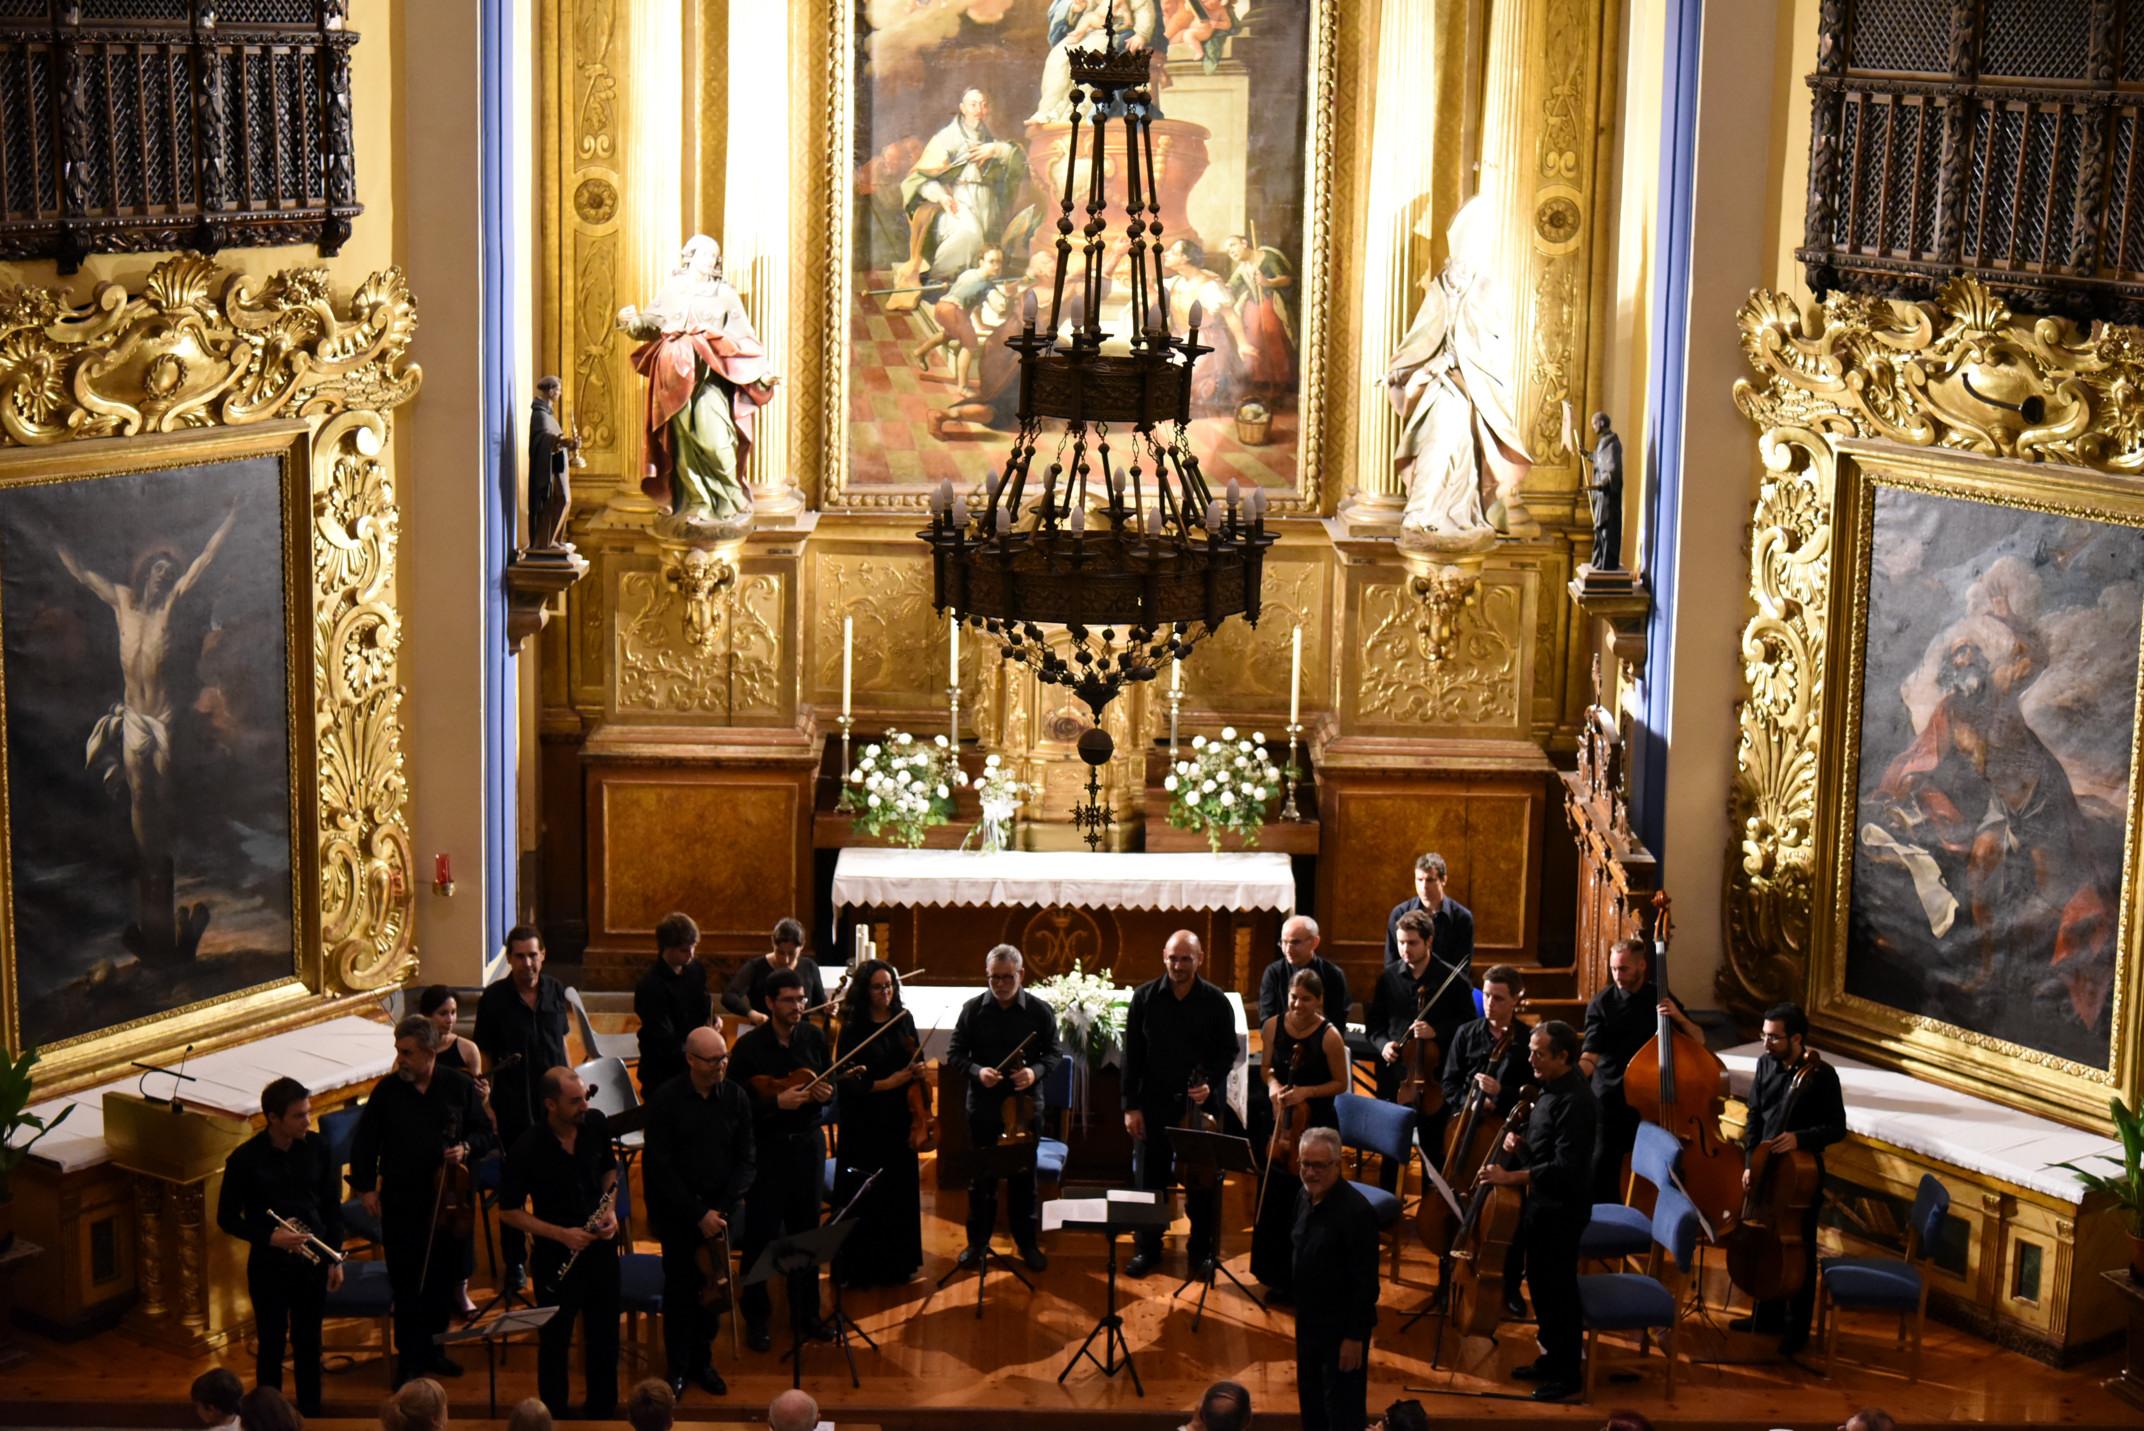 http://orquestatutti.com/wp/wp-content/uploads/2017/06/DSC_0260_11.jpg